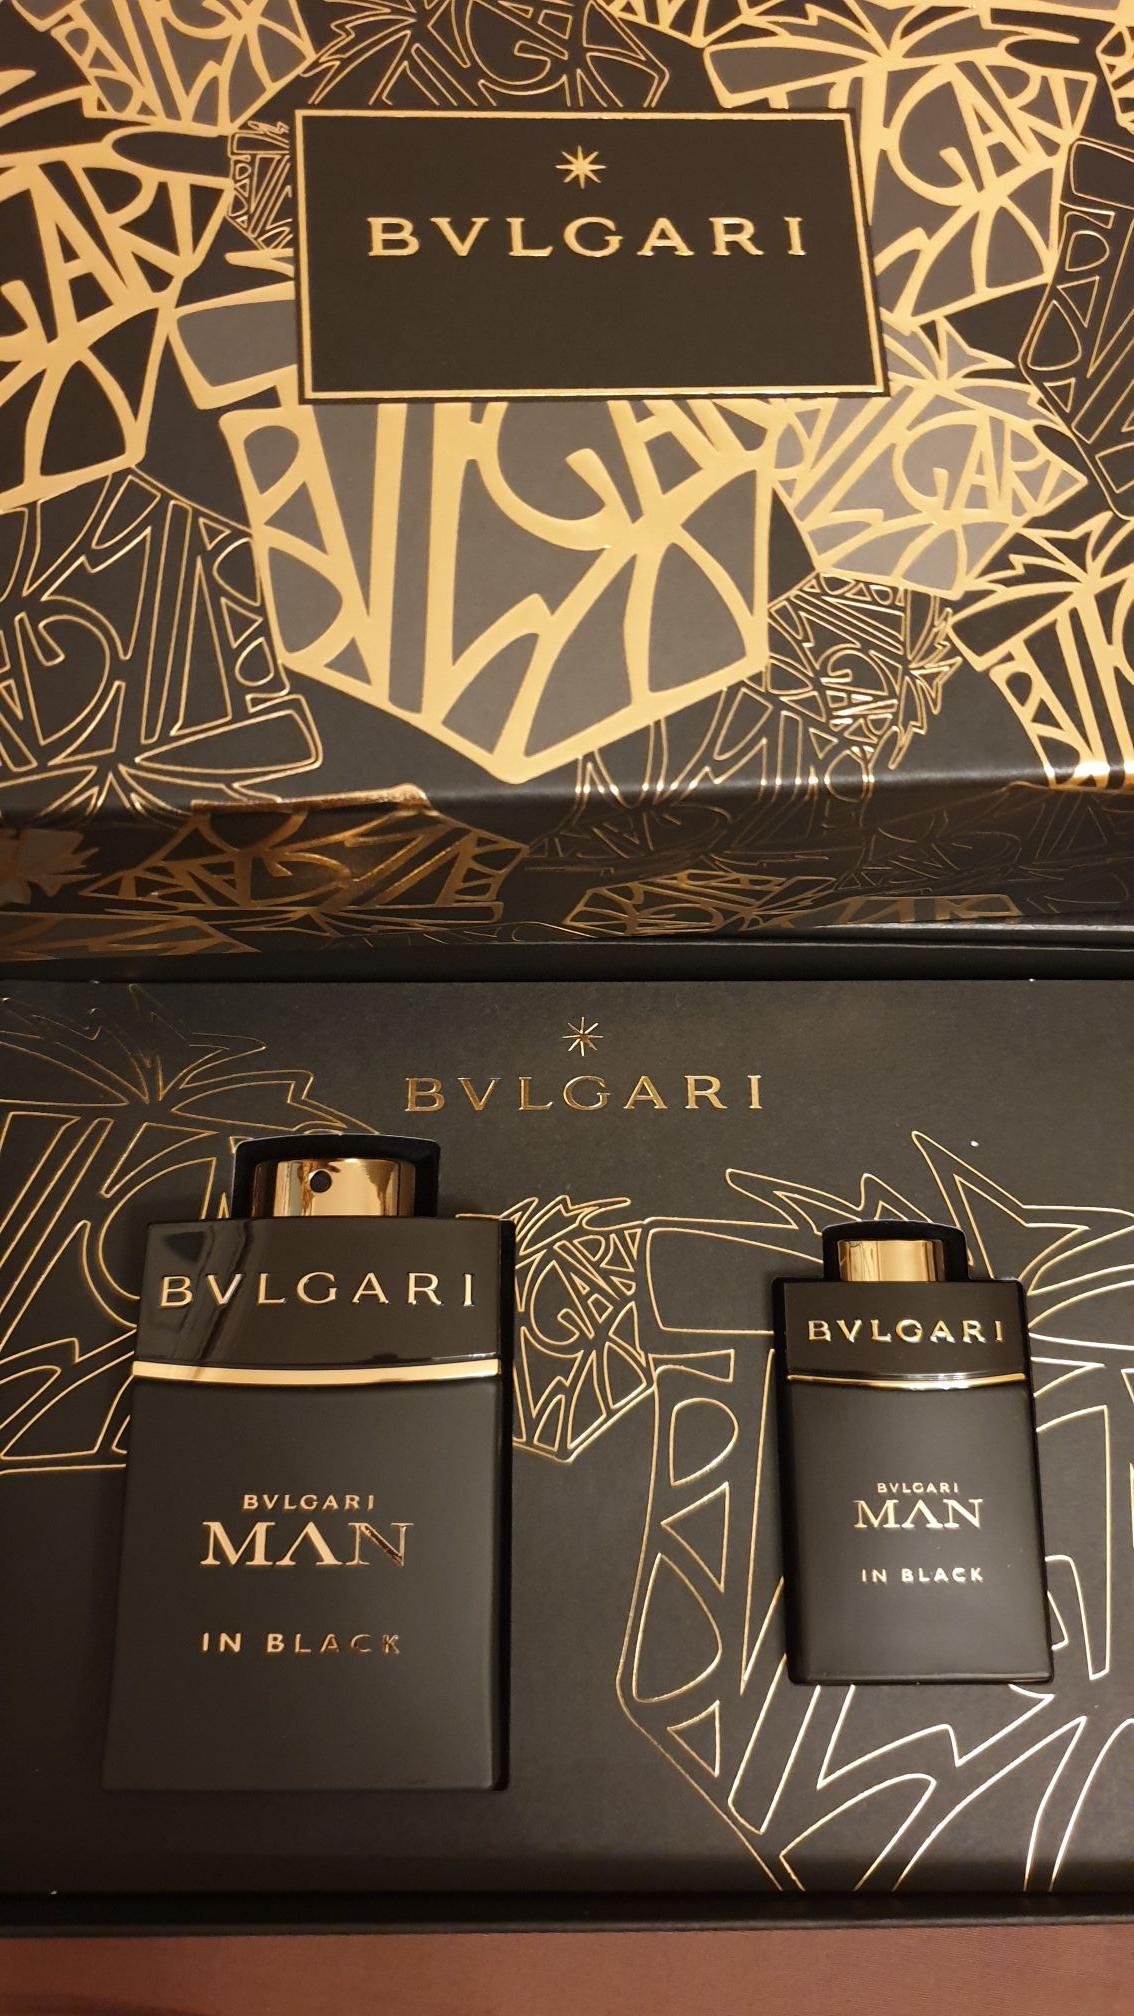 Bvlgari man in black 60ml + 15ml gift set - £35.69 Instore @ The Perfume Shop (London)